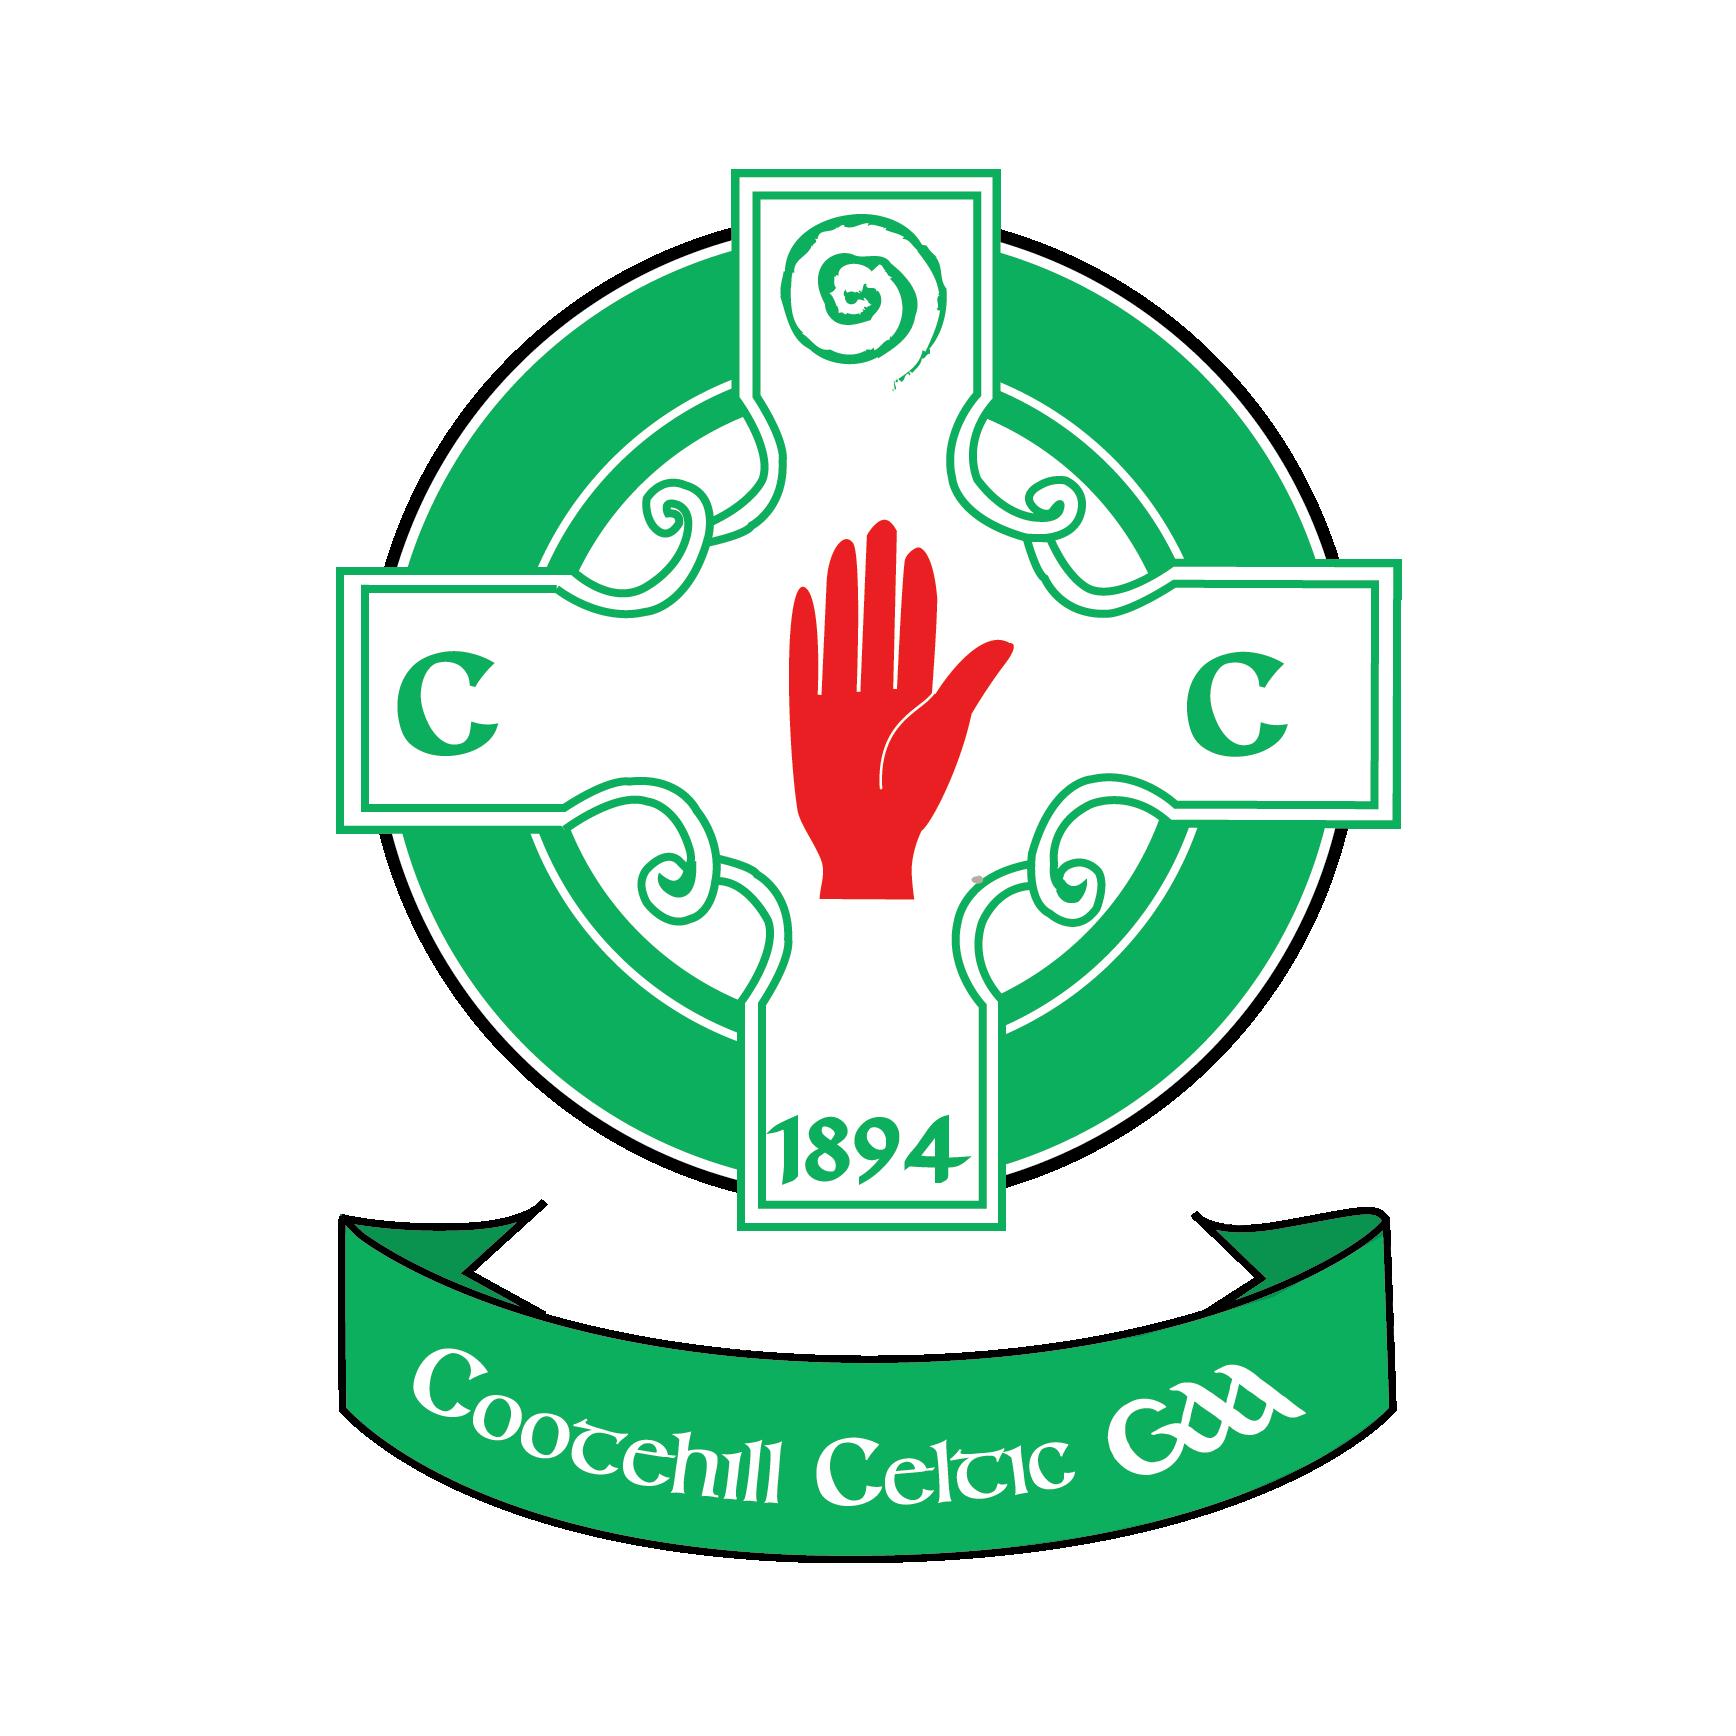 Cootehill Celtic GAA